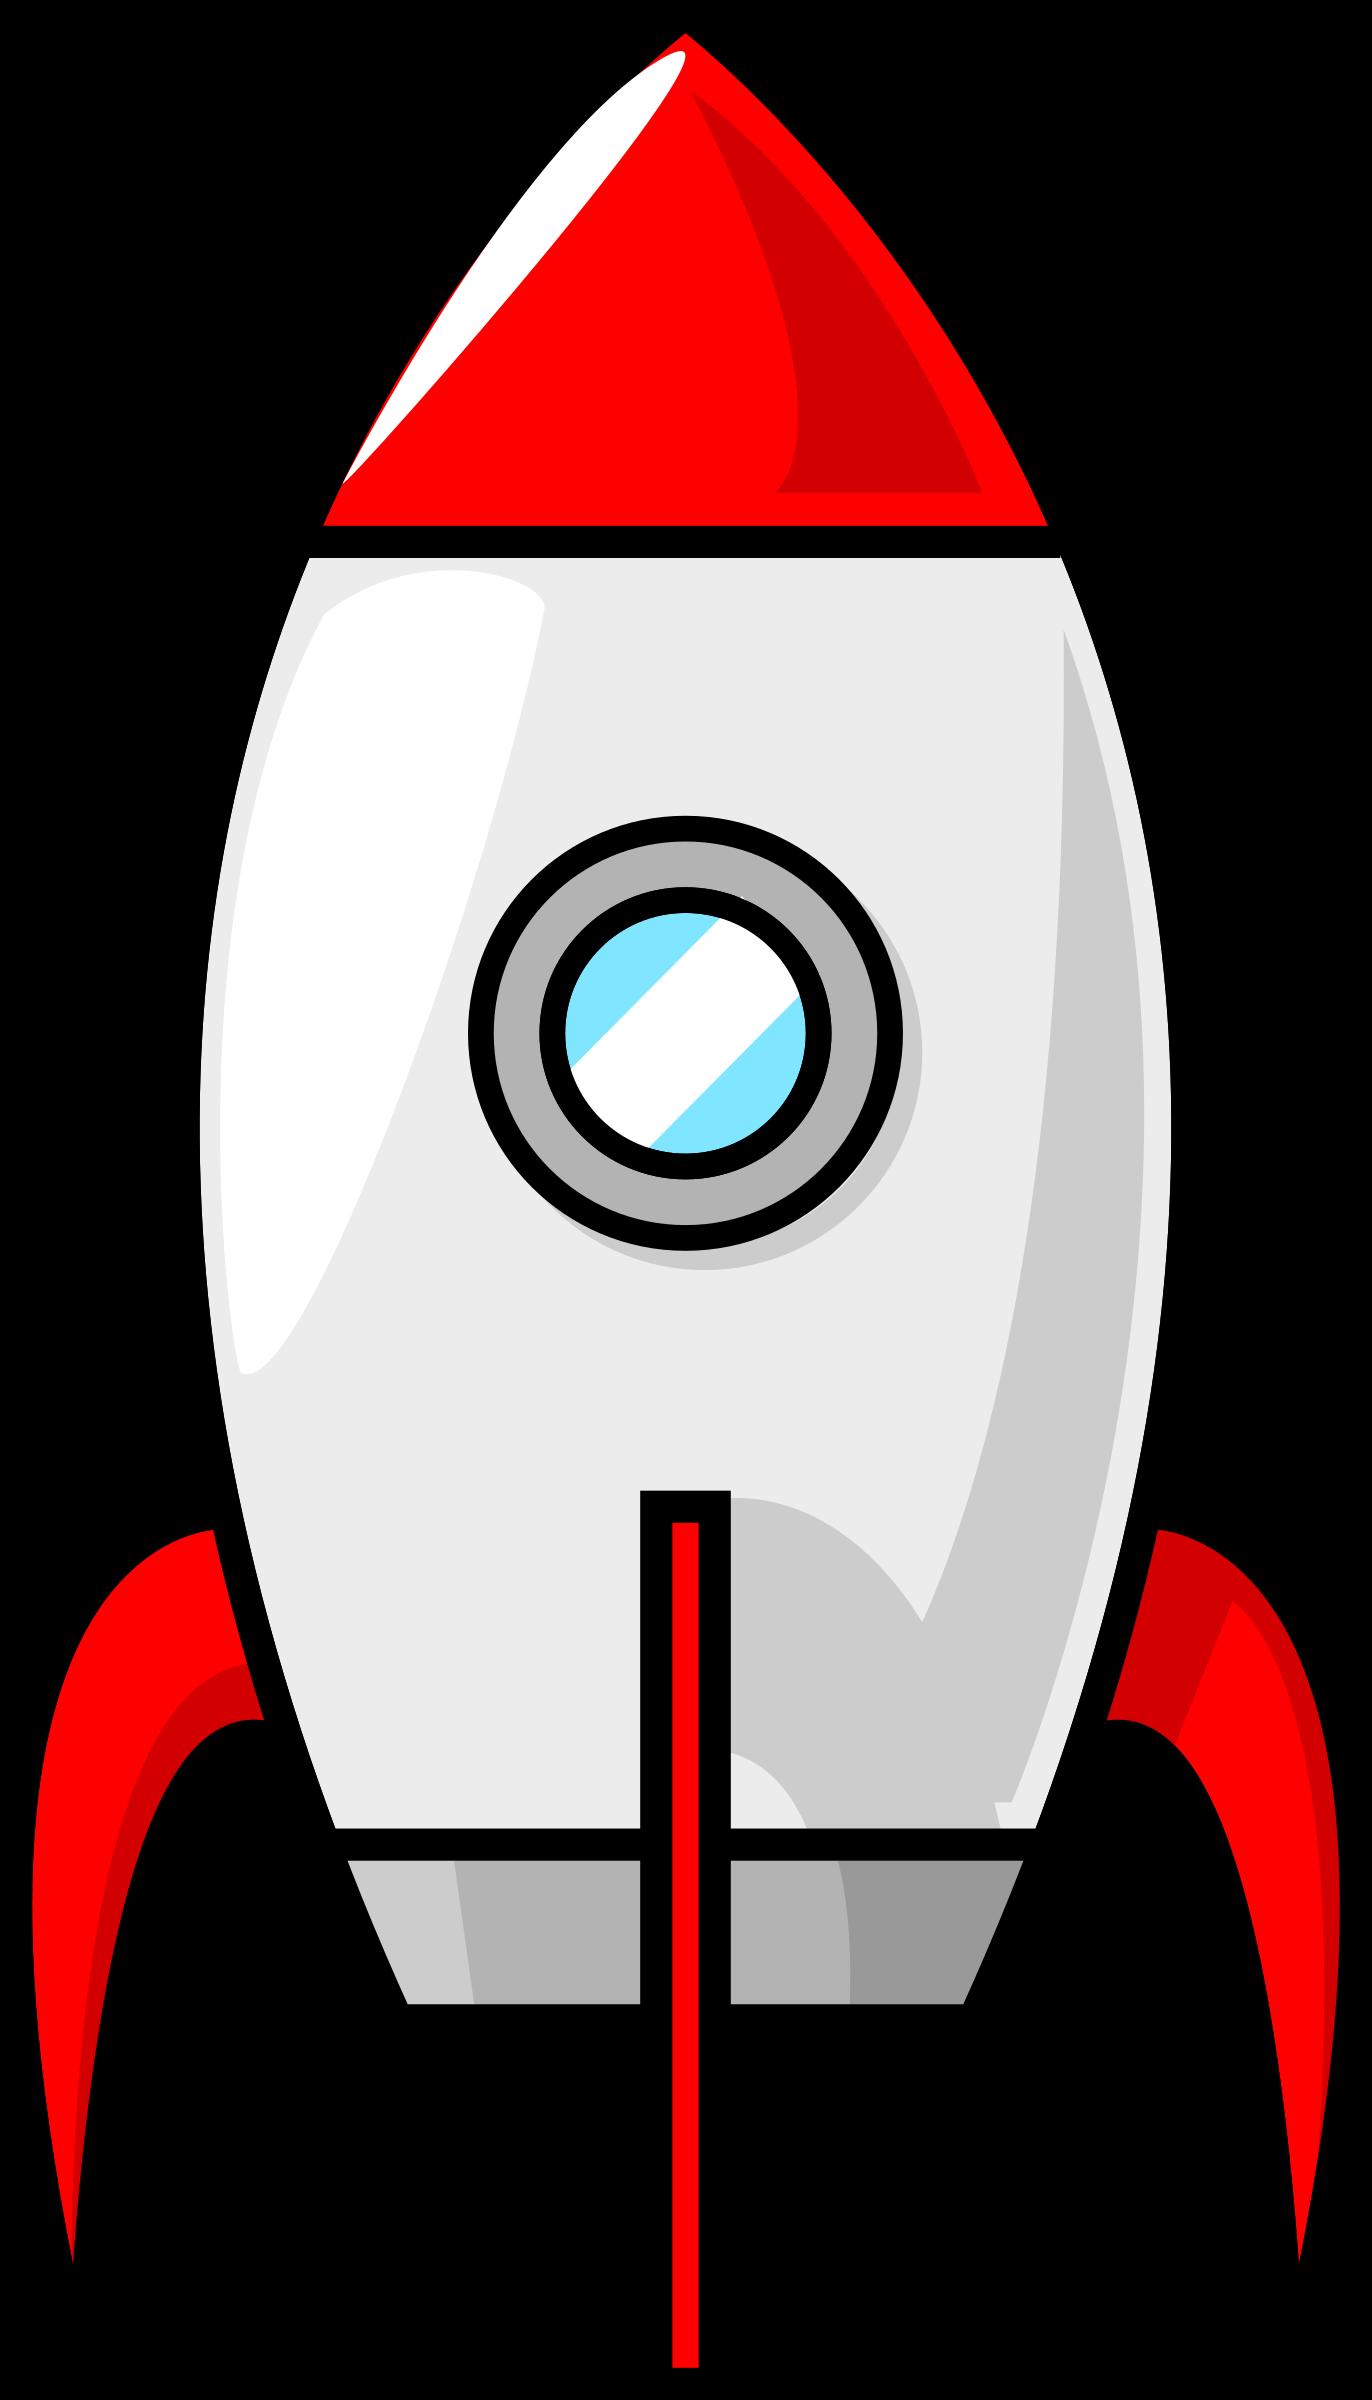 Cartoon spaceship clipart clipart royalty free download A cartoon moon rocket by purzen | Denim art | Rockets for kids ... clipart royalty free download